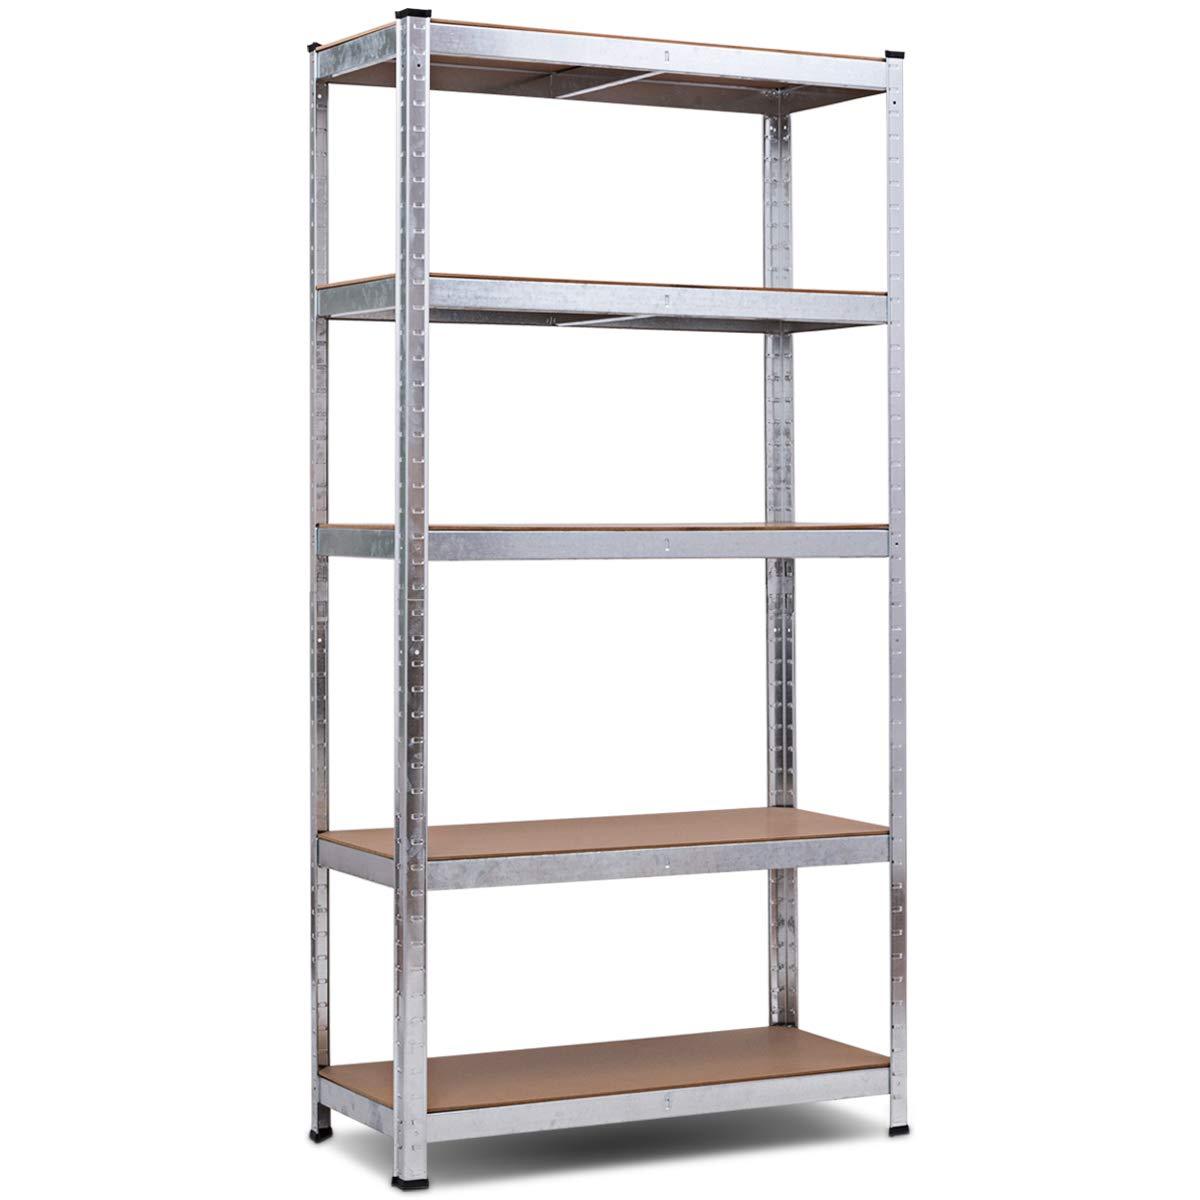 Giantex 5-Tier Shelving Rack Garage Storage Rack Adjustable Shelves Steel Multipurpose Display Stand Bolt-Free Assembly by Giantex